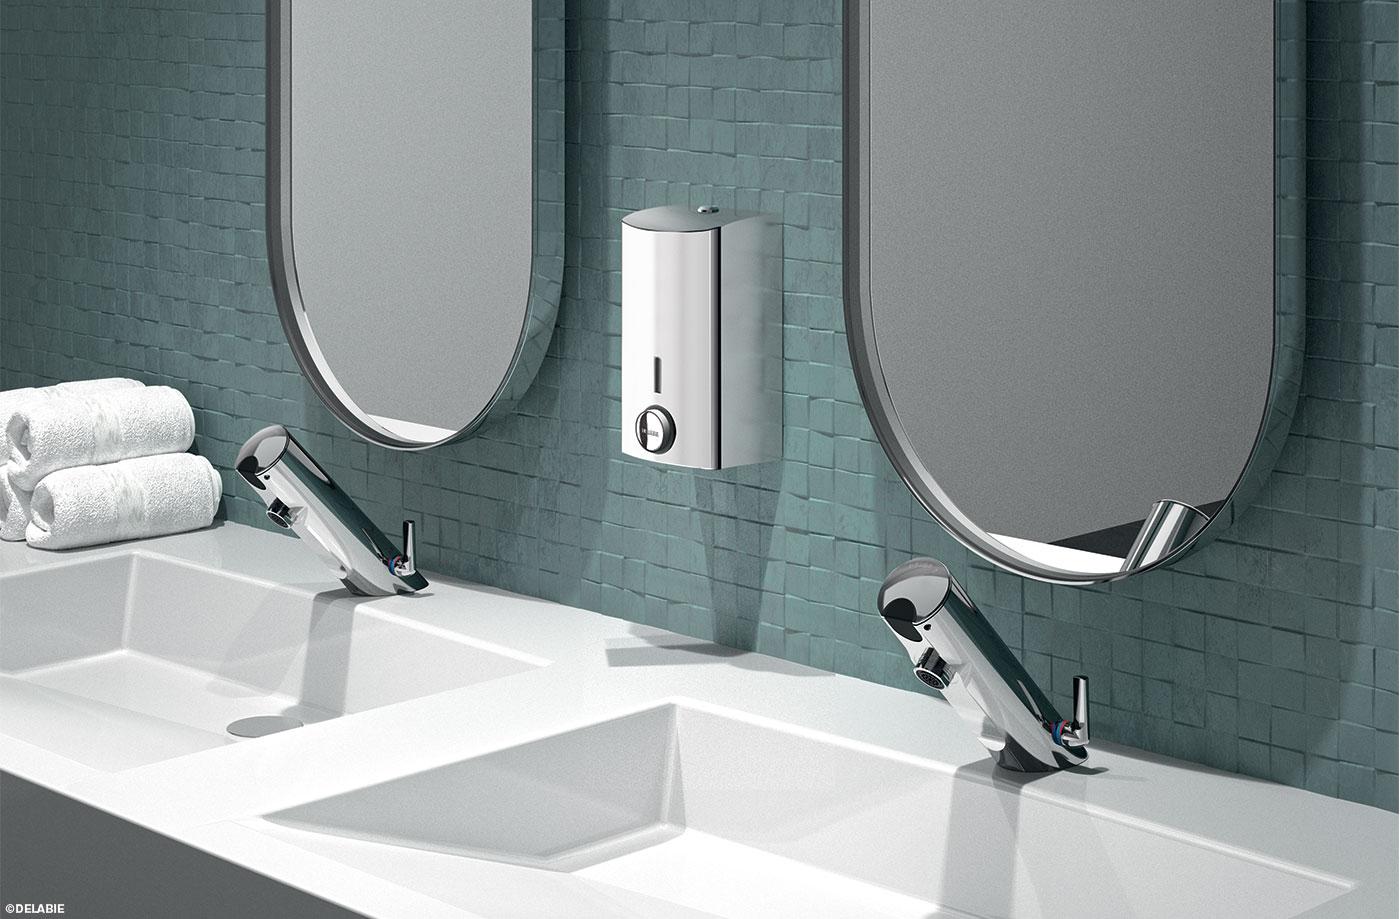 Public/Commercial Washroom